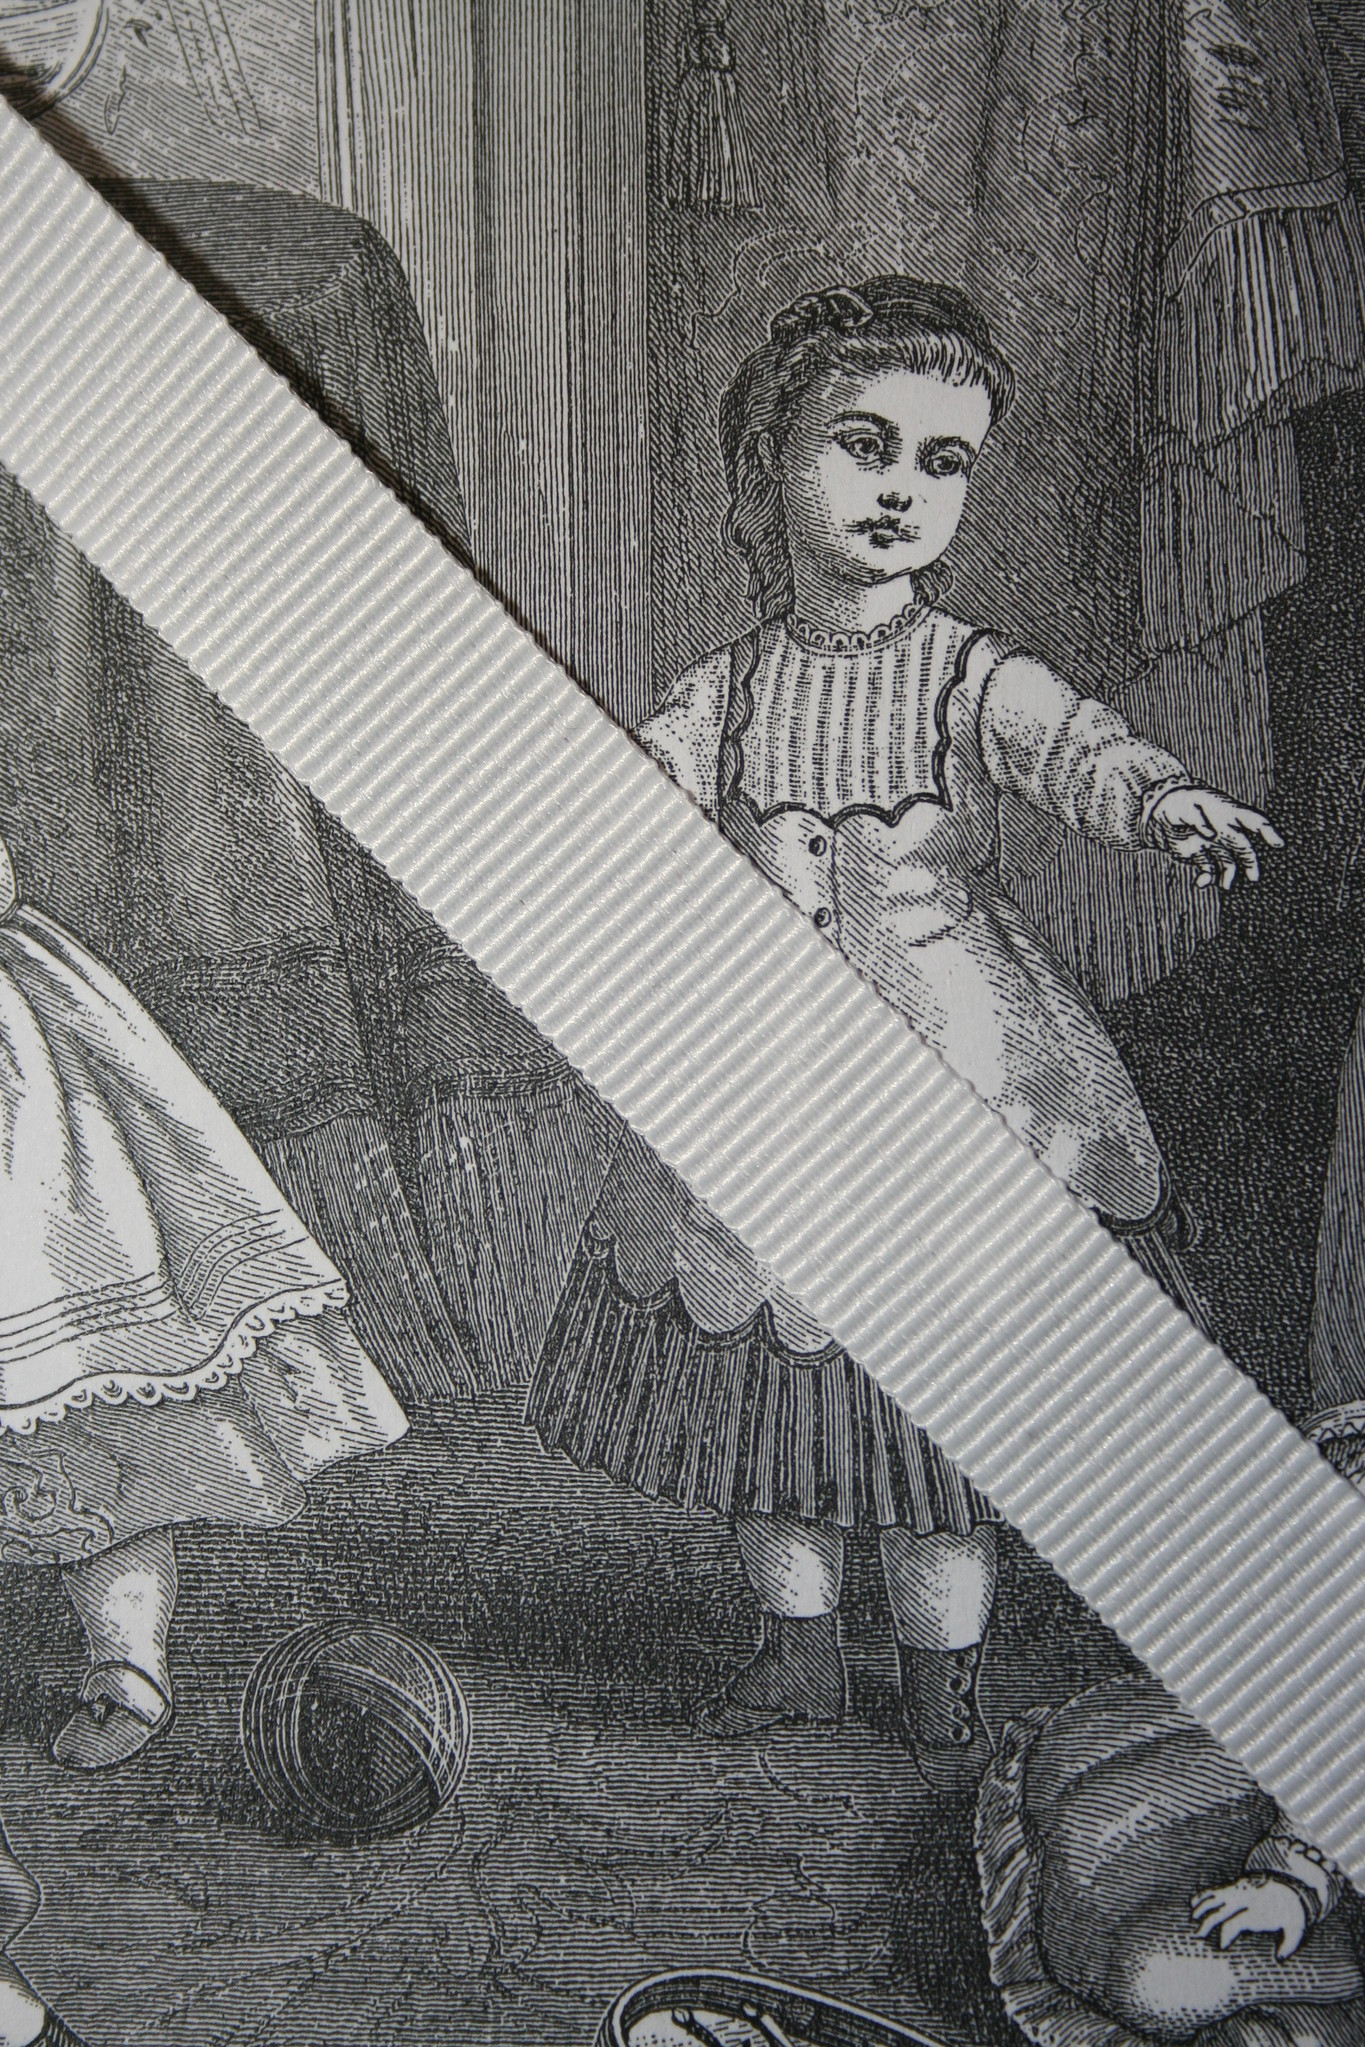 Grossgrain ribbon.